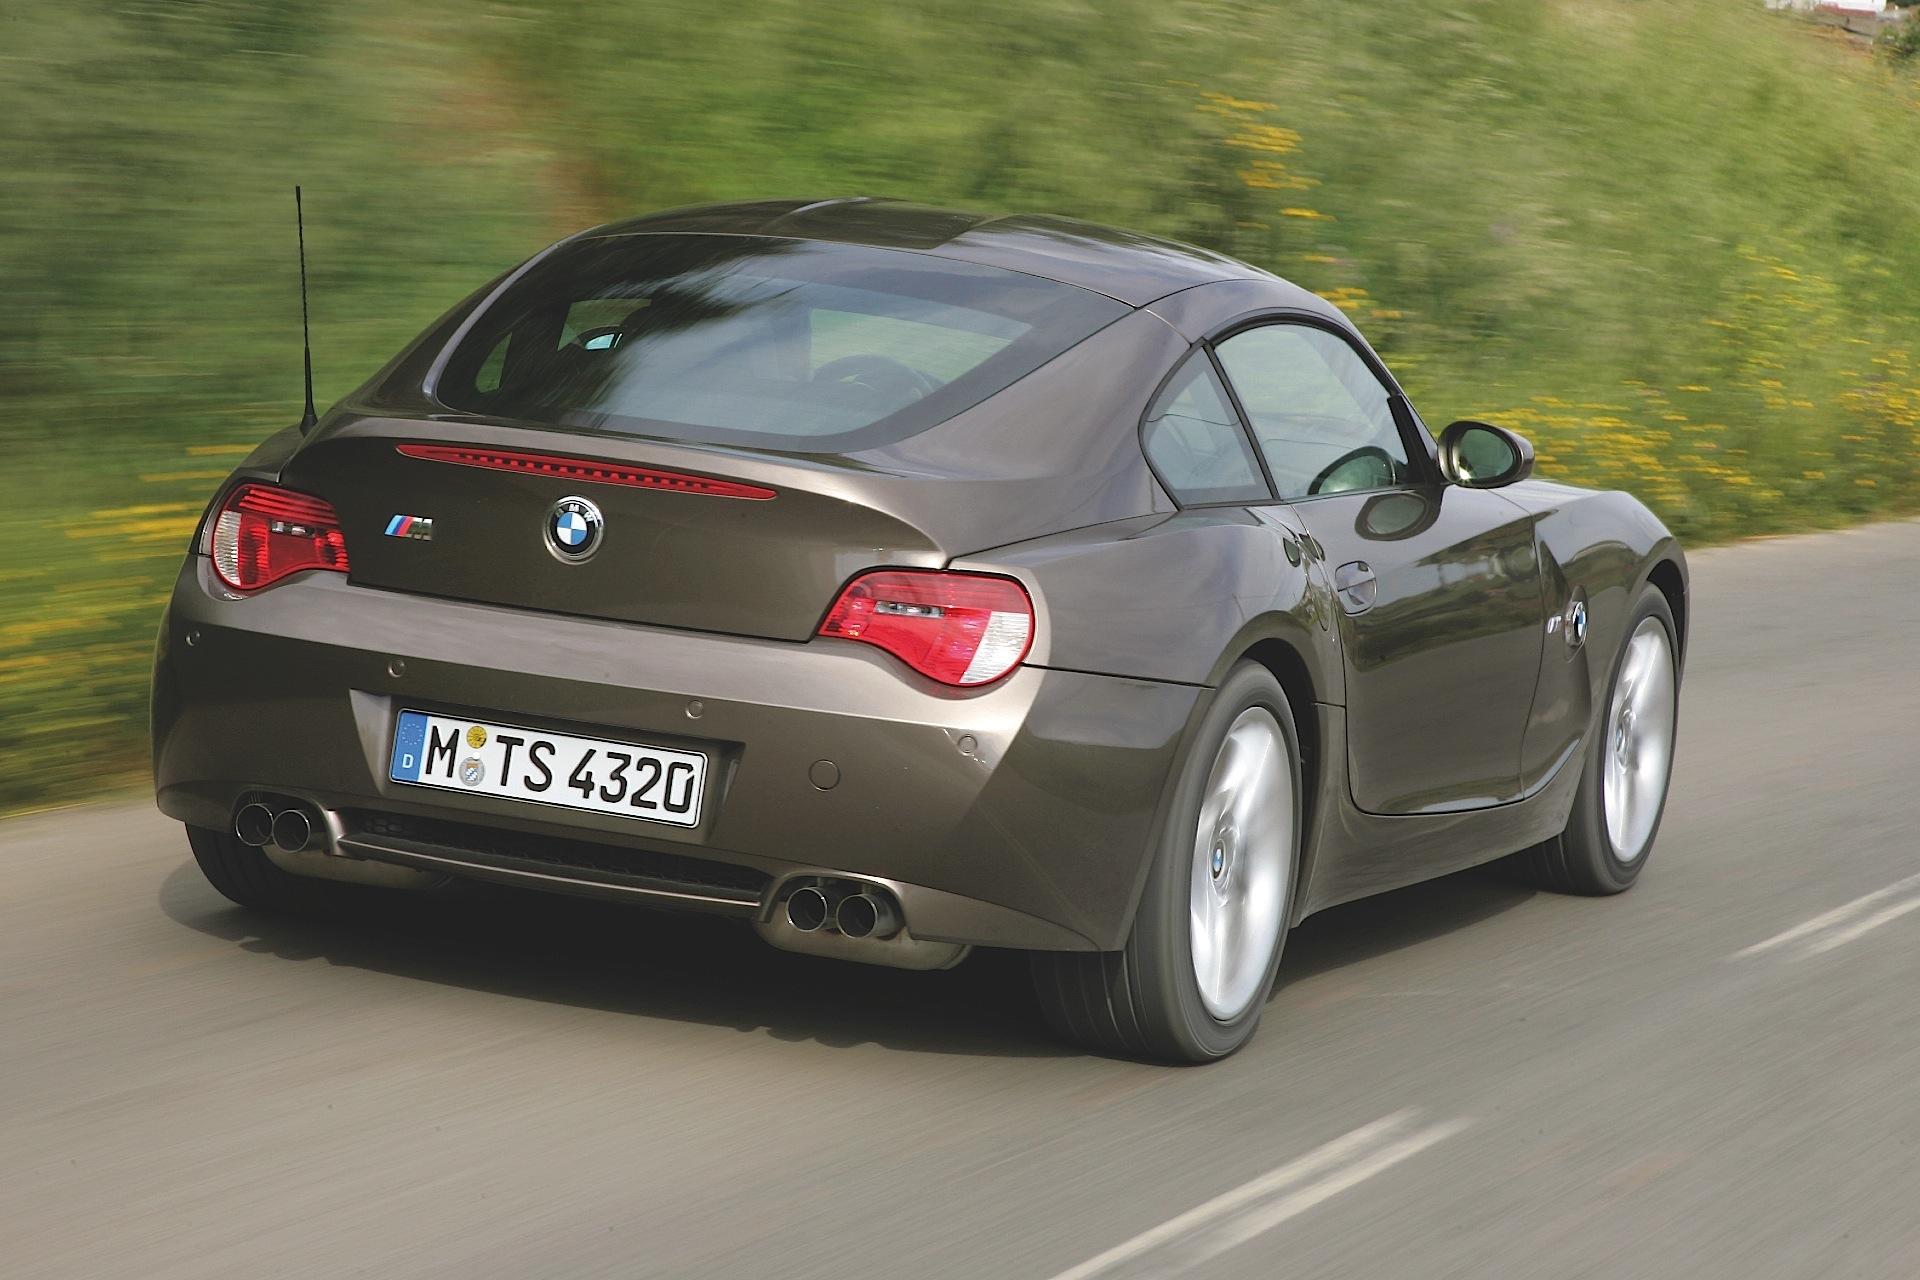 BMW Z4 M Coupe (E86) specs - 2006, 2007, 2008, 2009 - autoevolution